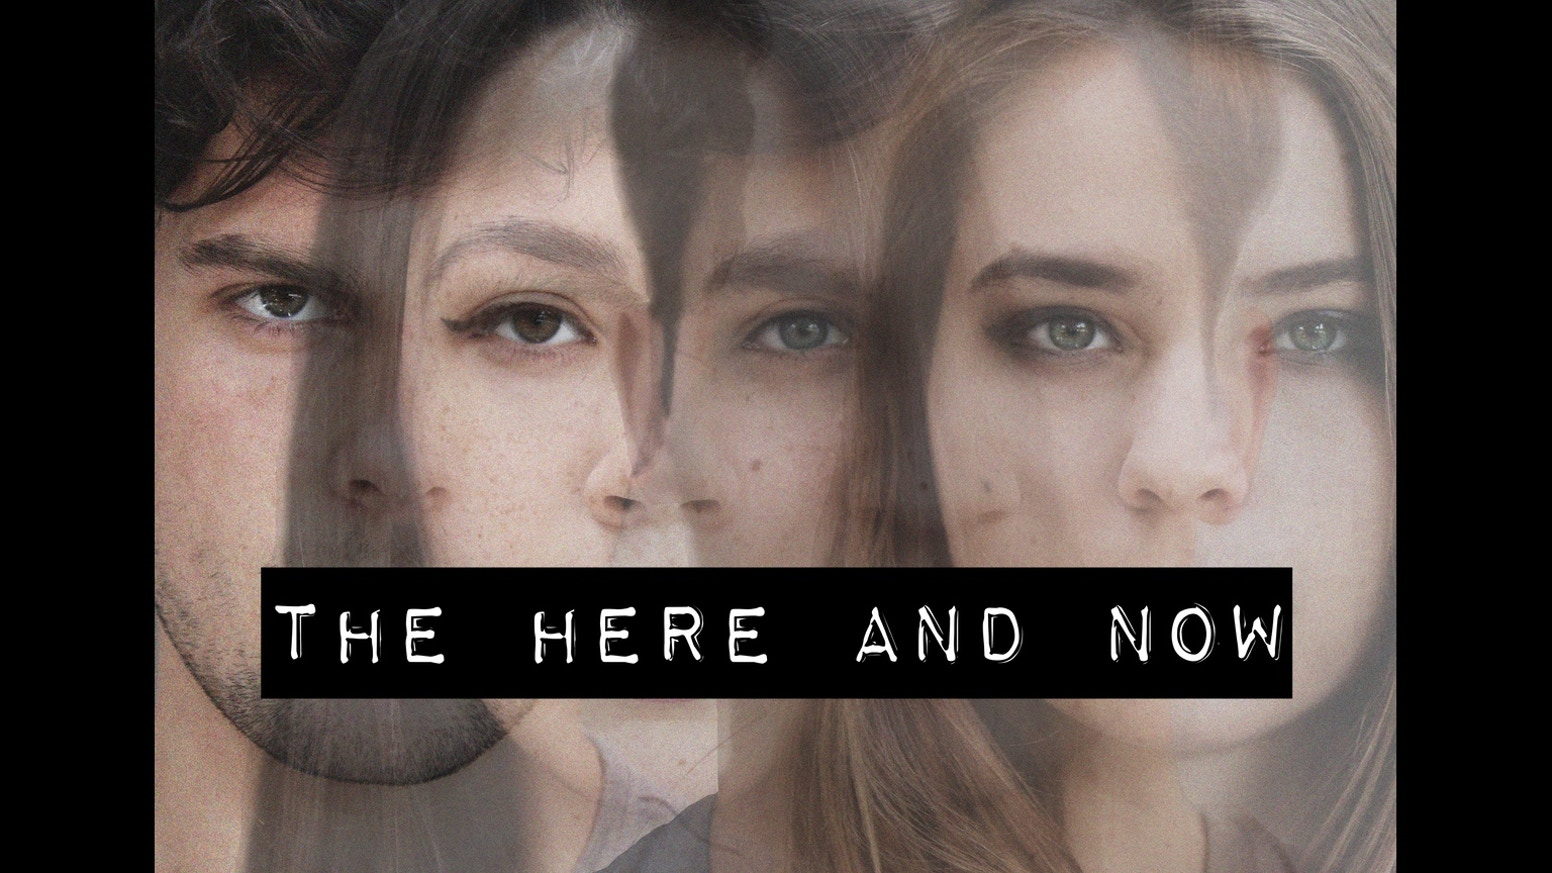 da343c4ba58 The Here and Now by Ally Christensson & Arleta Knottnerus — Kickstarter